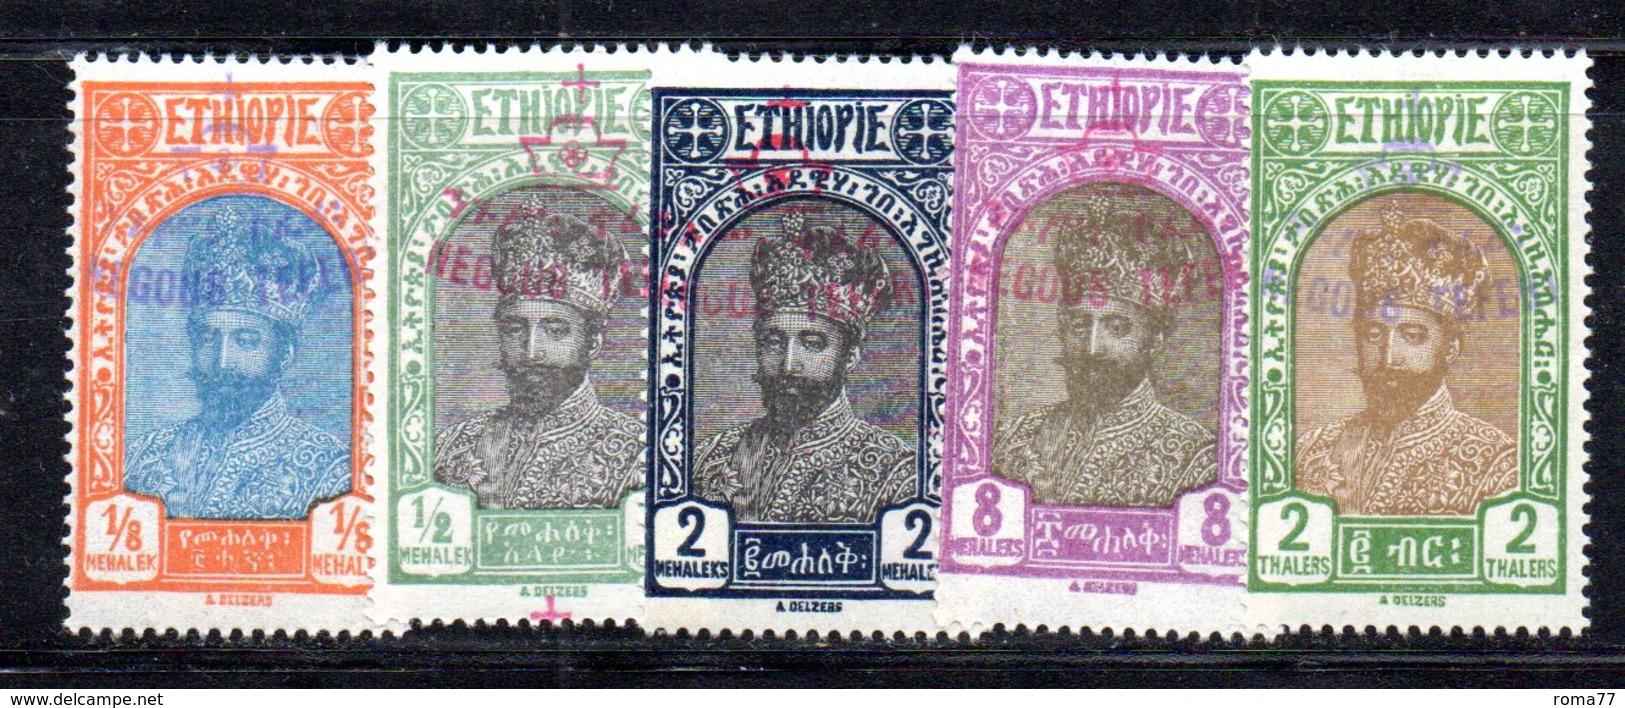 ETP133 - ETIOPIA 1928 , Serie Yvert N. 166/170  *  Linguella  (2380A).  Ras Tafari - Ethiopie